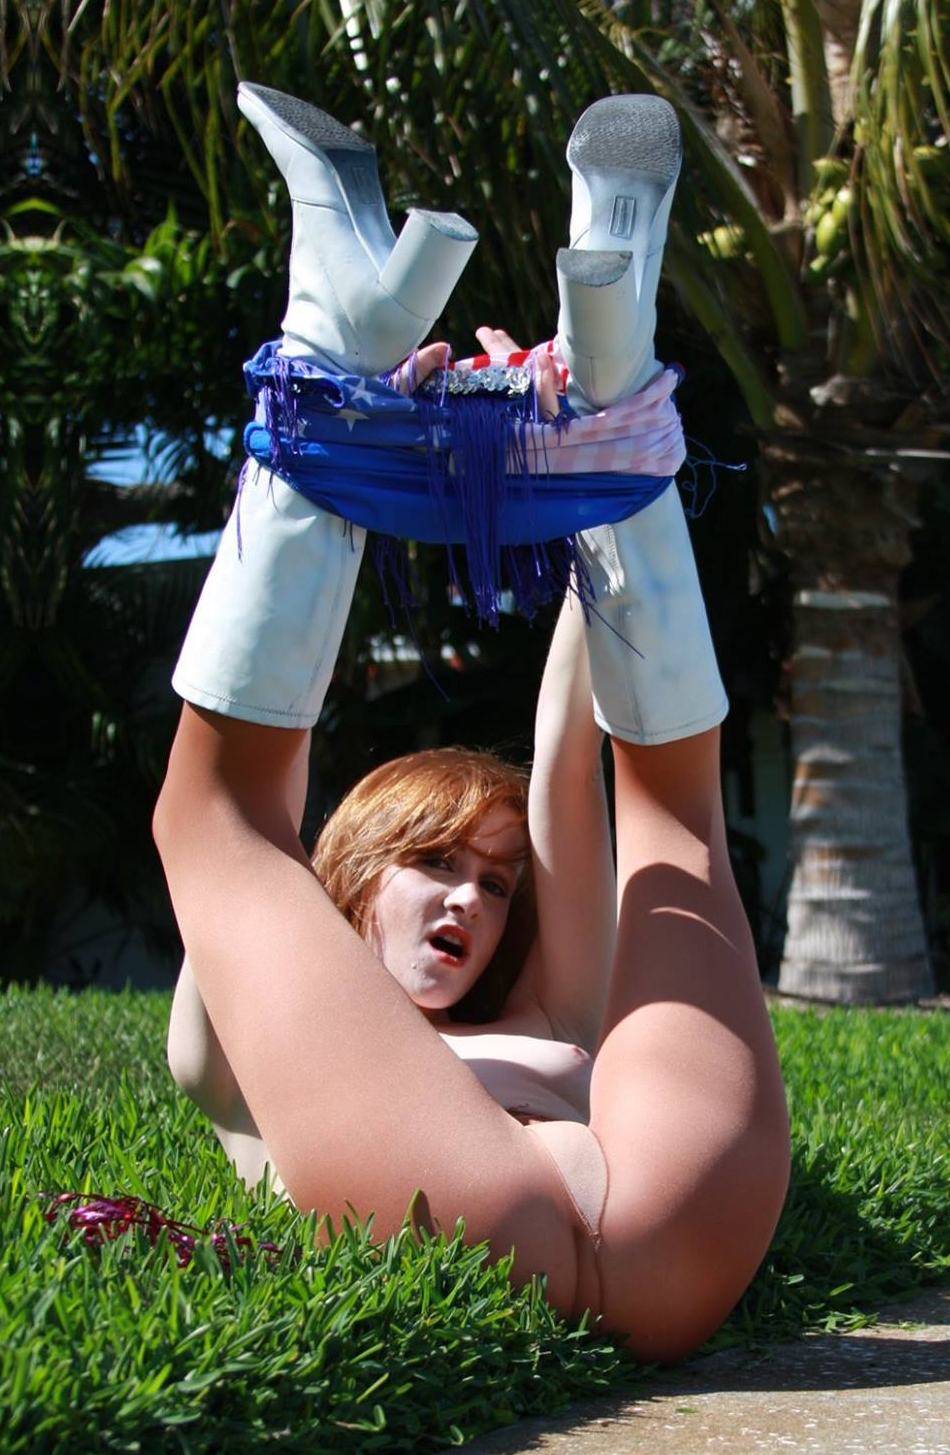 Redhead Cheerleader wearing Tan Sheer Pantyhose and Showing Boobs